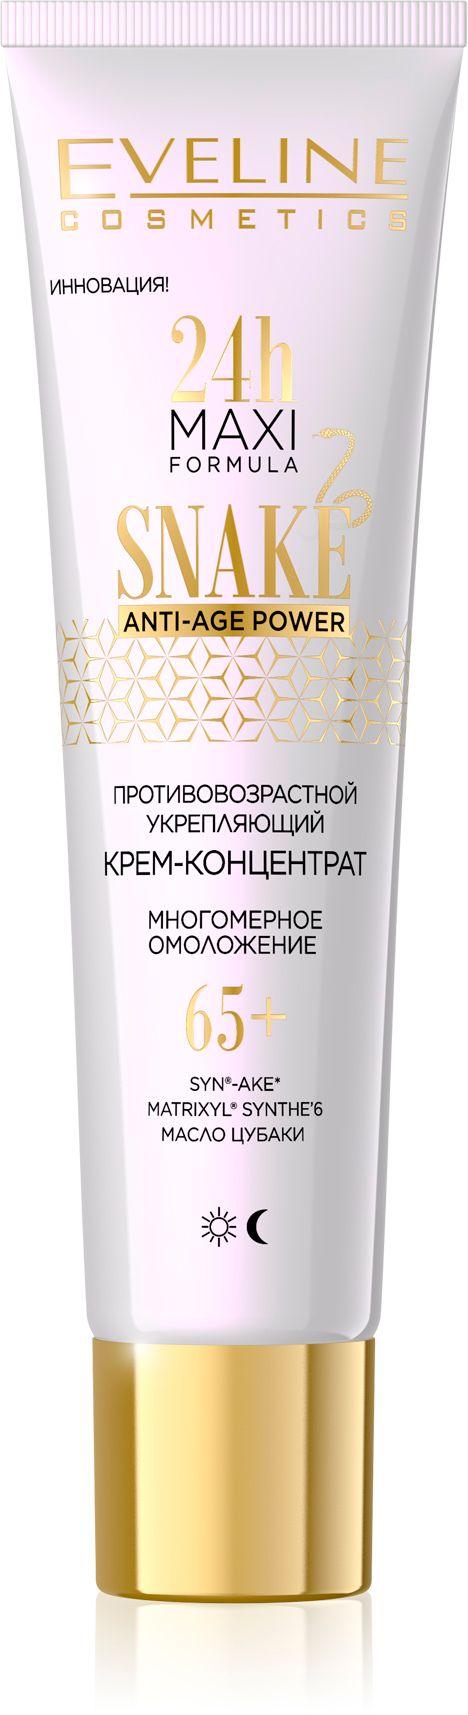 Anti-aging firming cream concentrate 65+ 24h series maxi formula, Avon, 40 ml